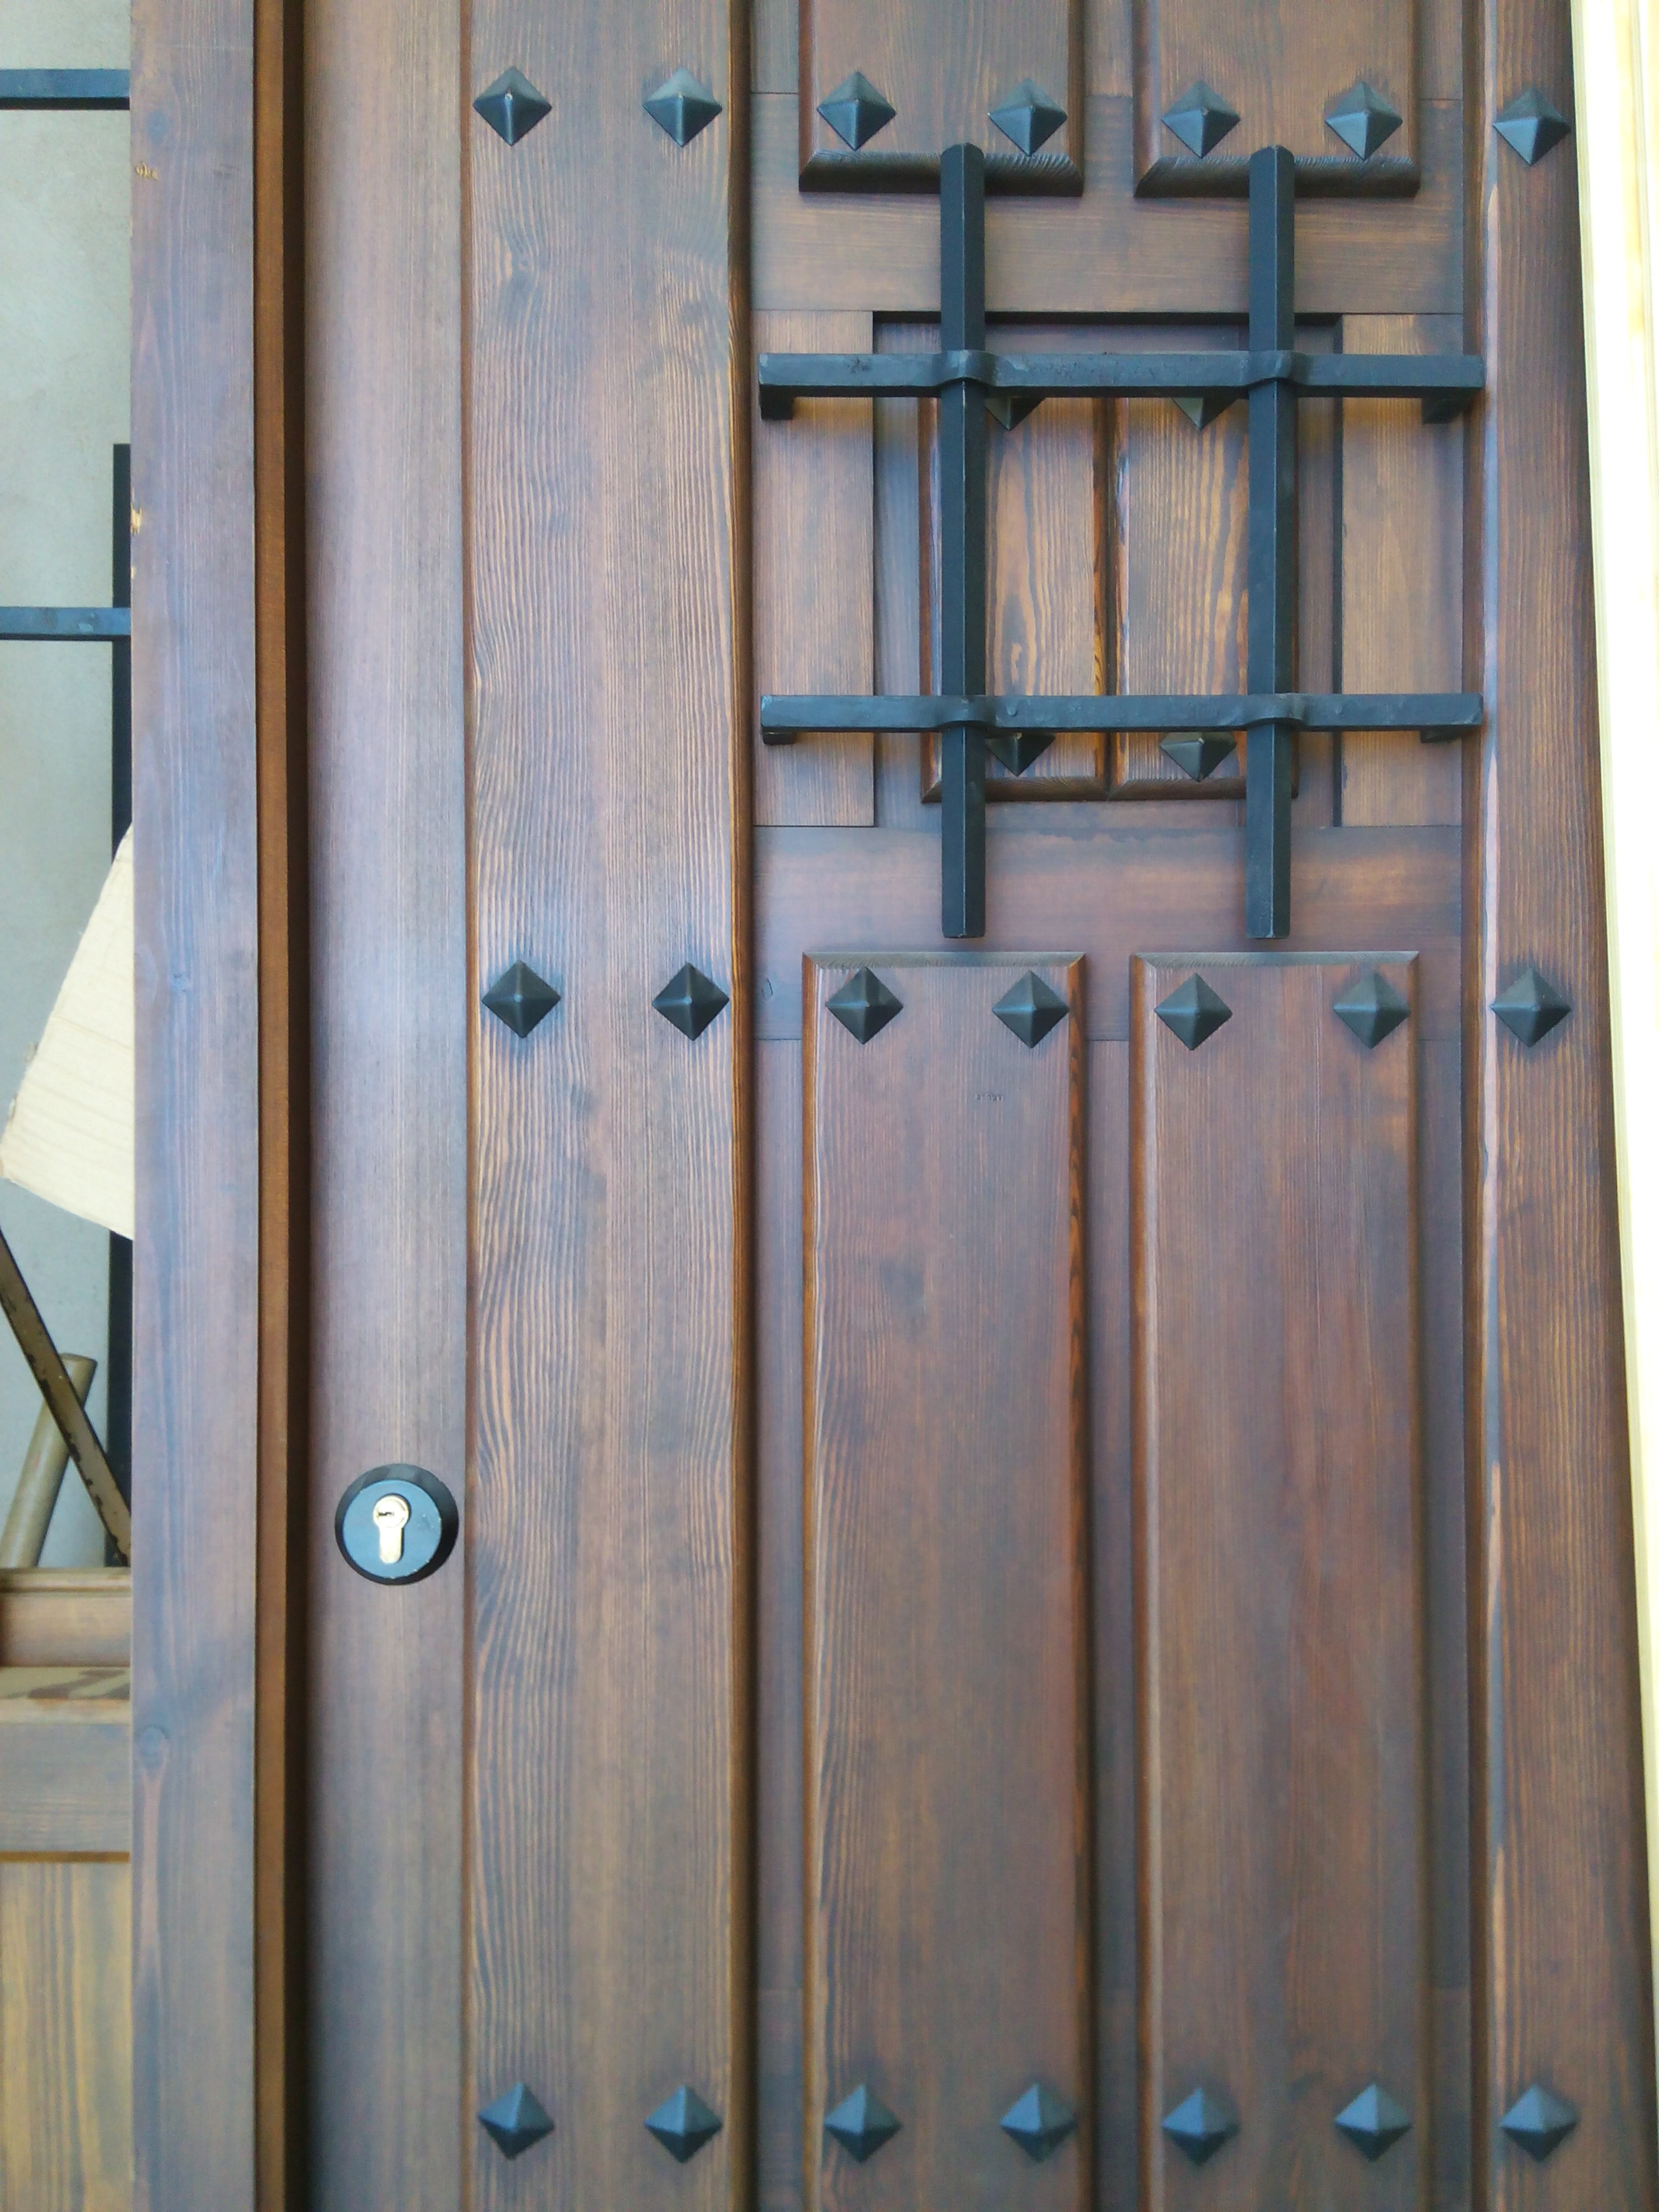 Pintura puertas madera gallery of ce apartamento interior - Pintura puertas madera ...